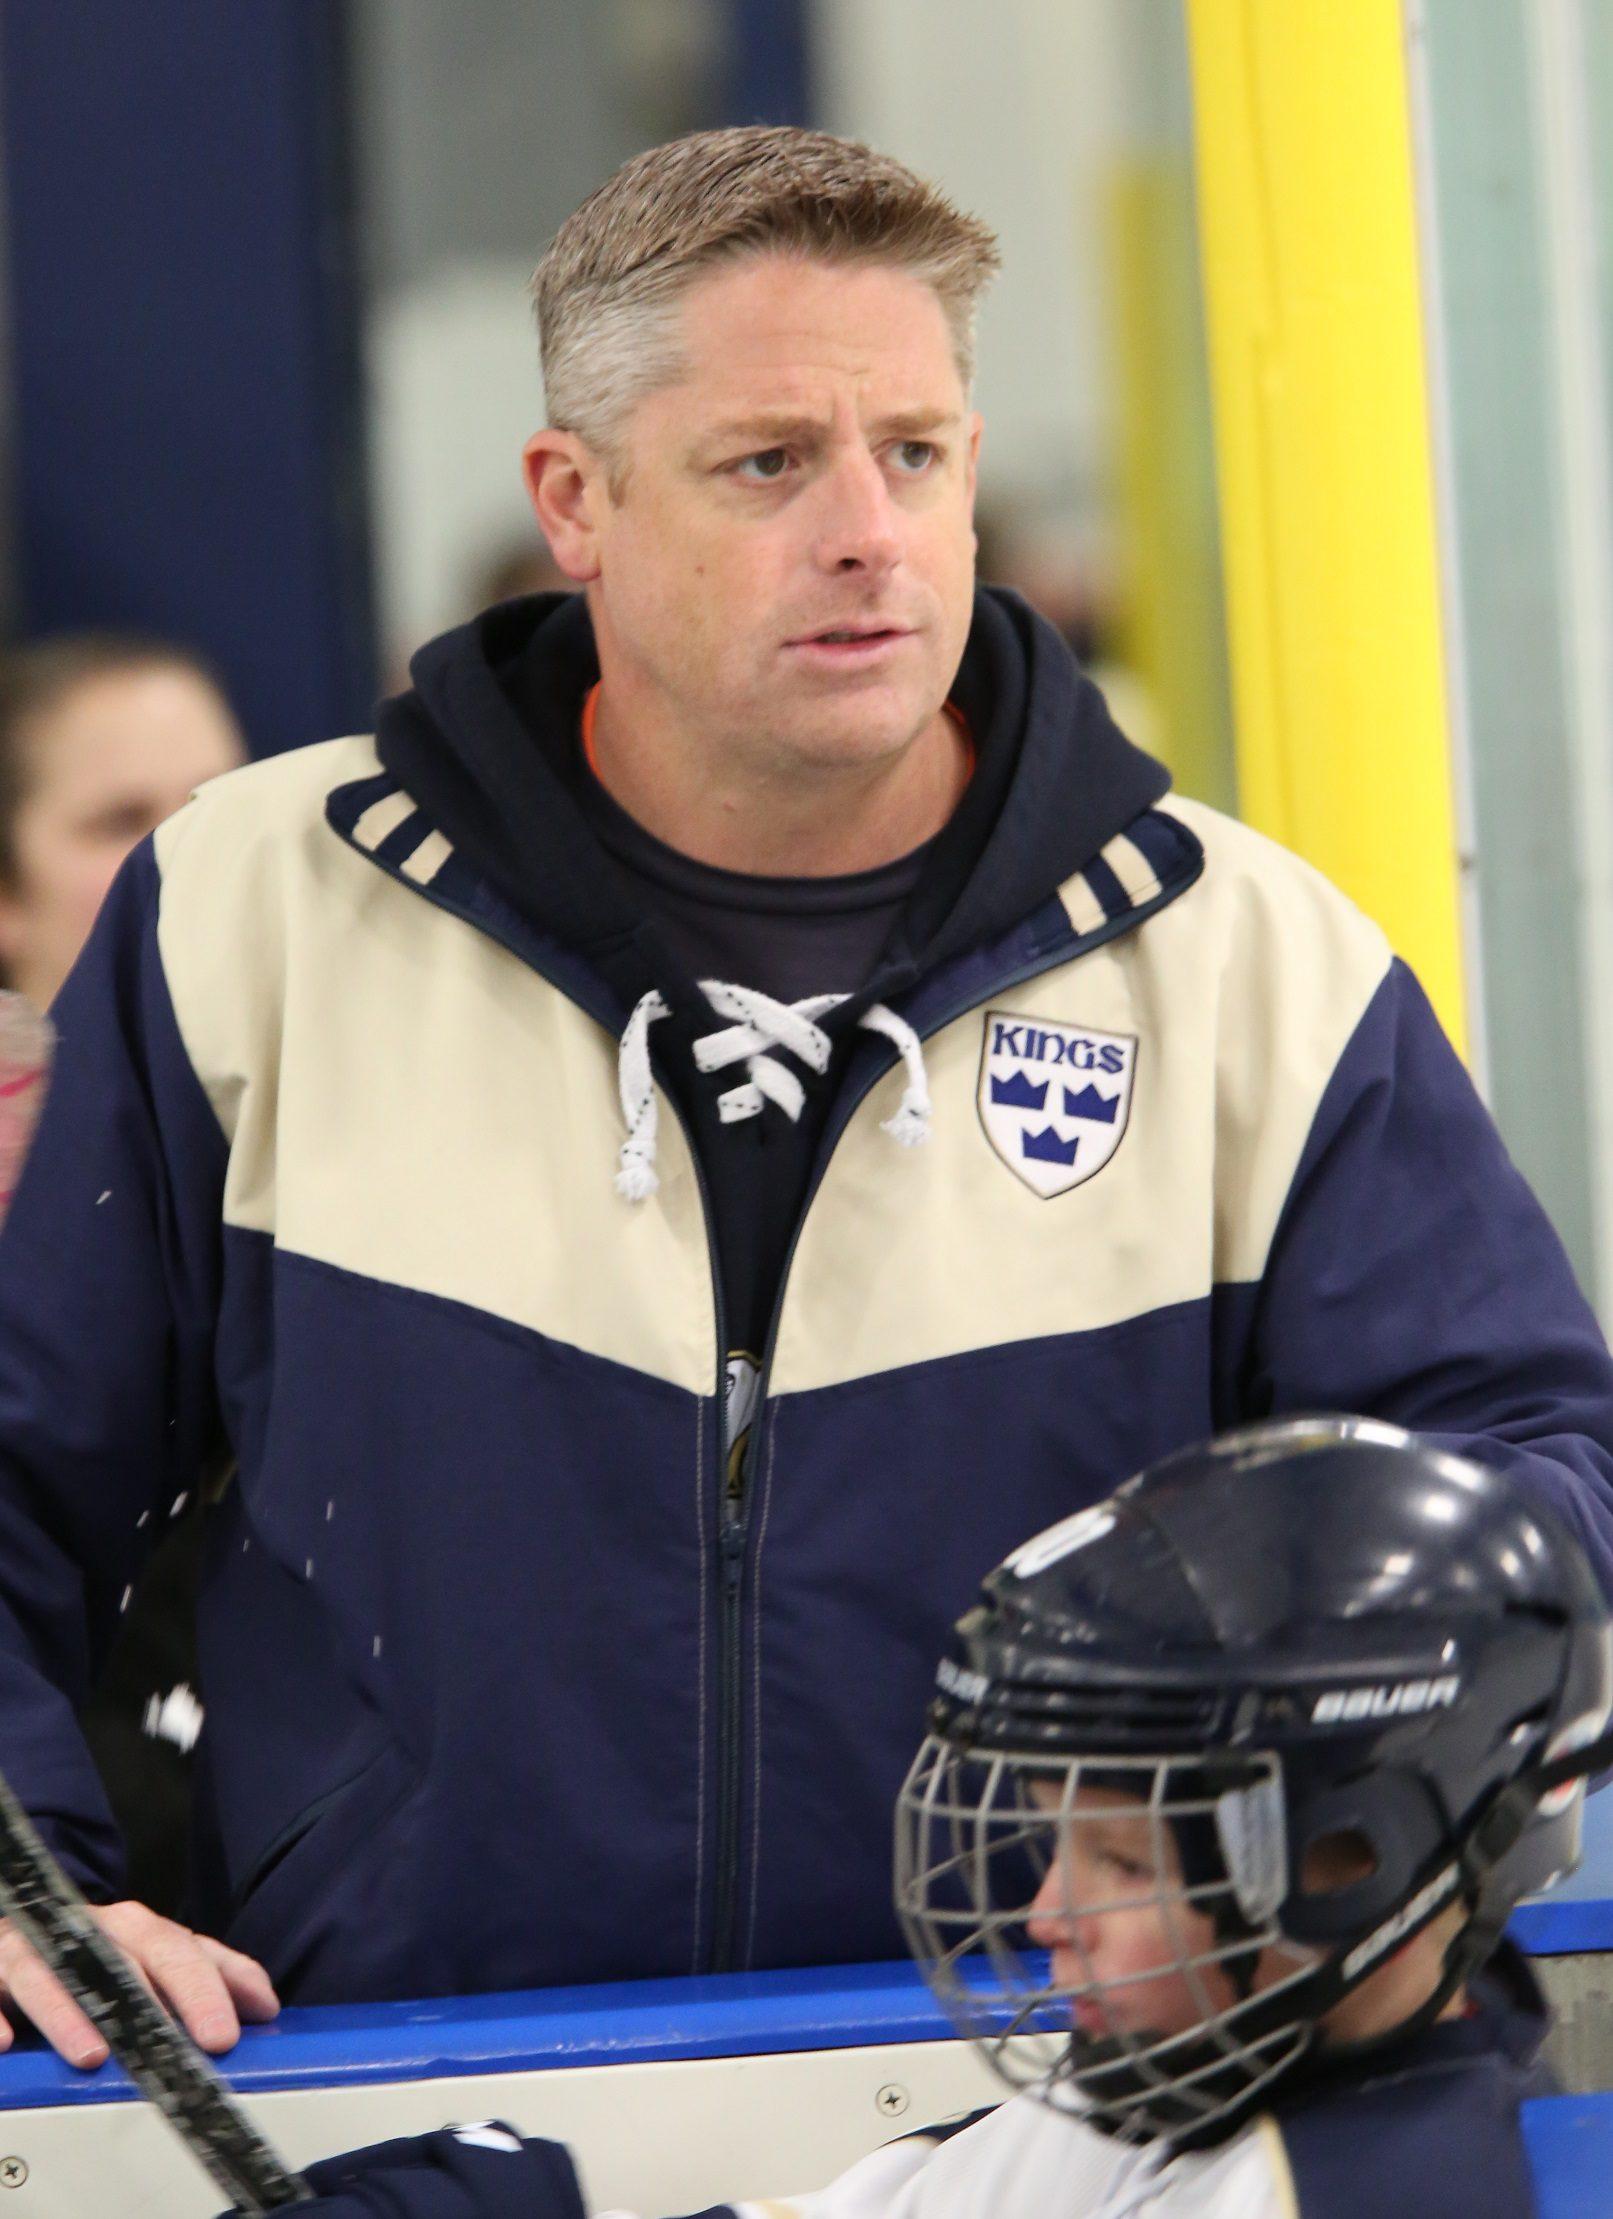 2019 20 Coaches Skylands Kings